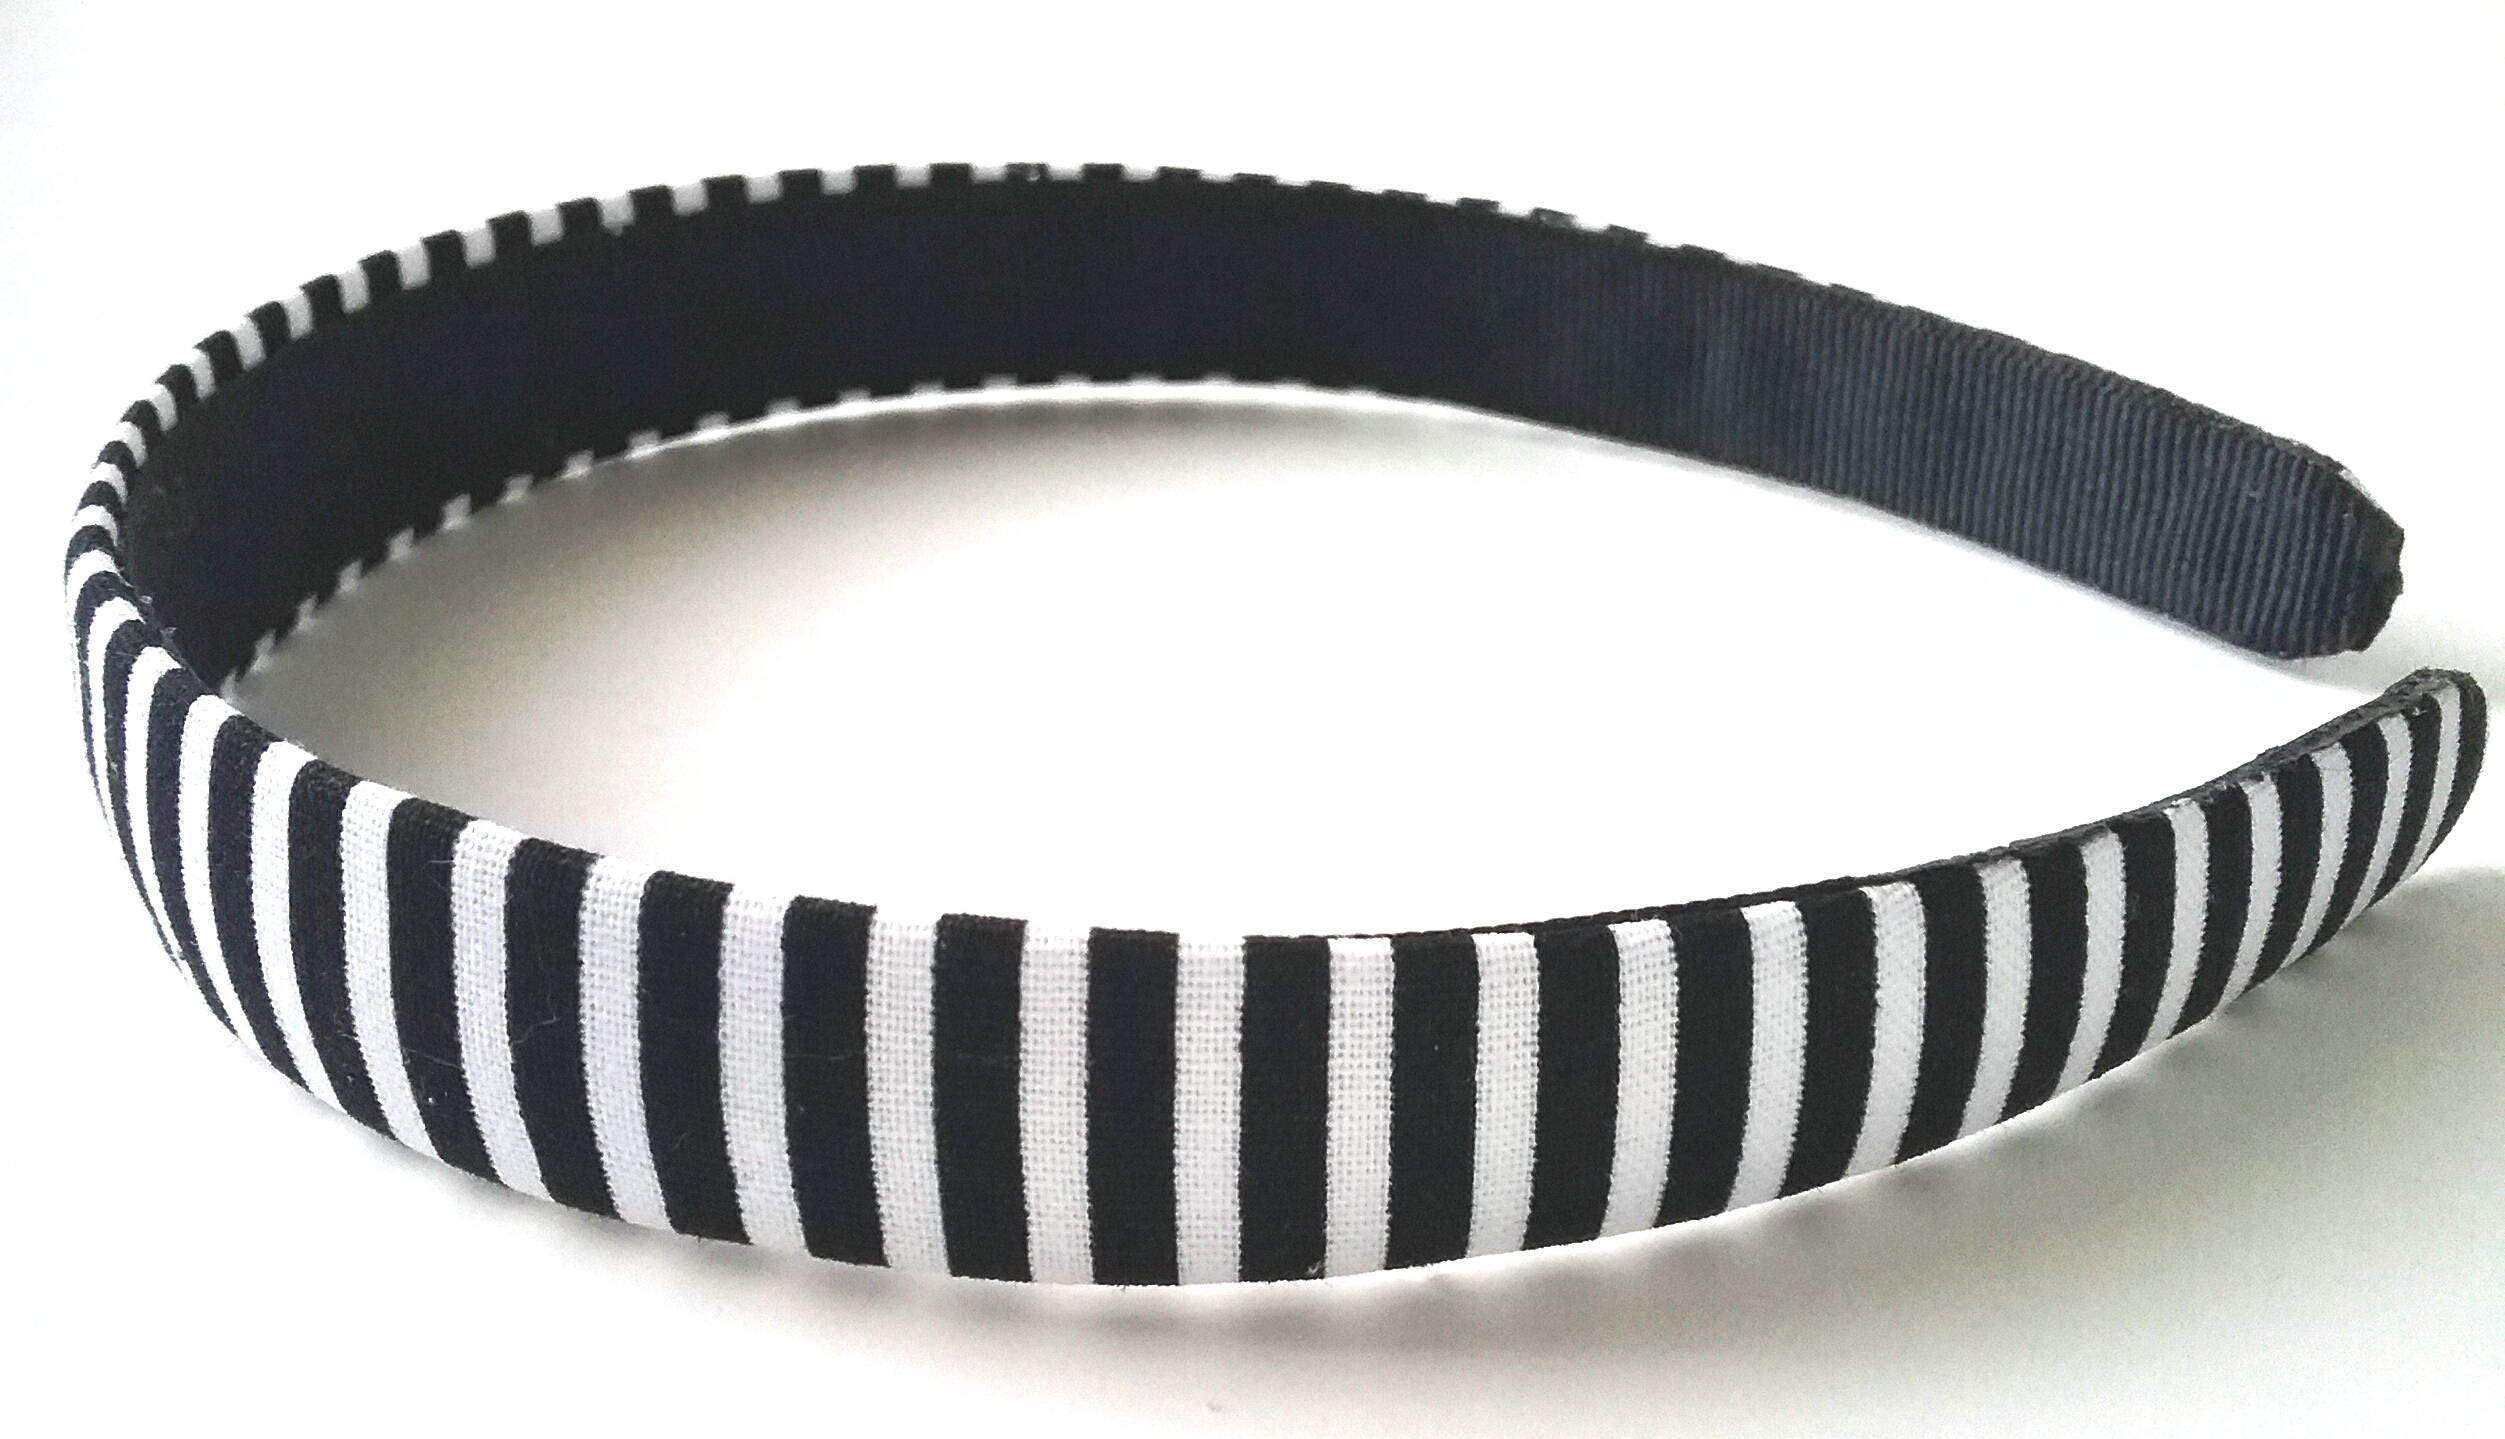 Black White Striped Headband 34 Inch  211fcfaad27